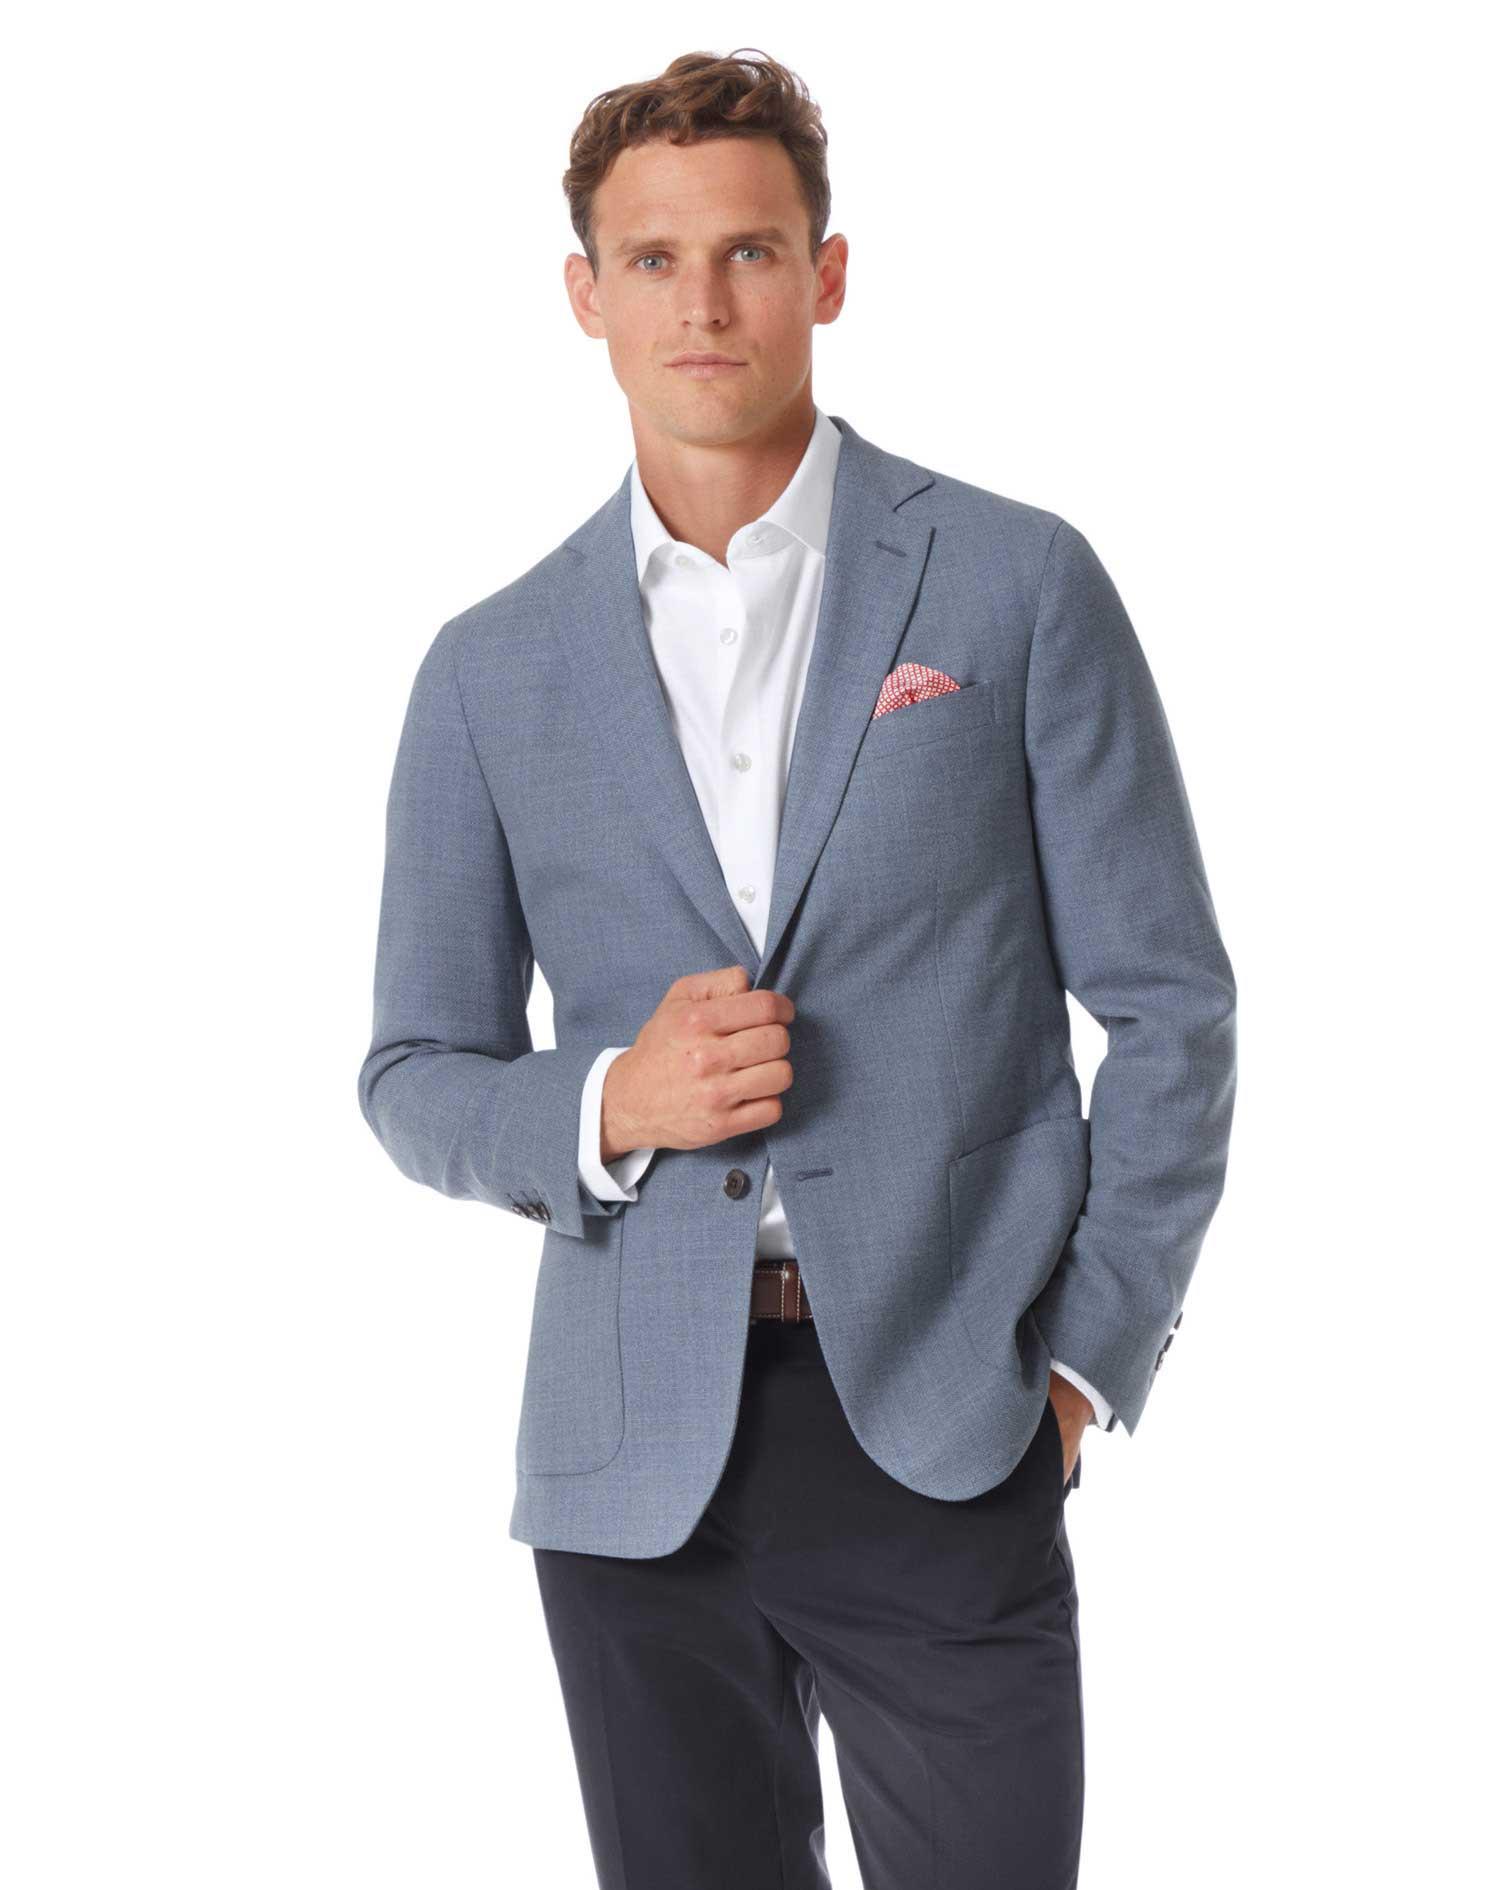 Slim Fit Light Blue Italian Wool Blazer Size 40 Regular by Charles Tyrwhitt